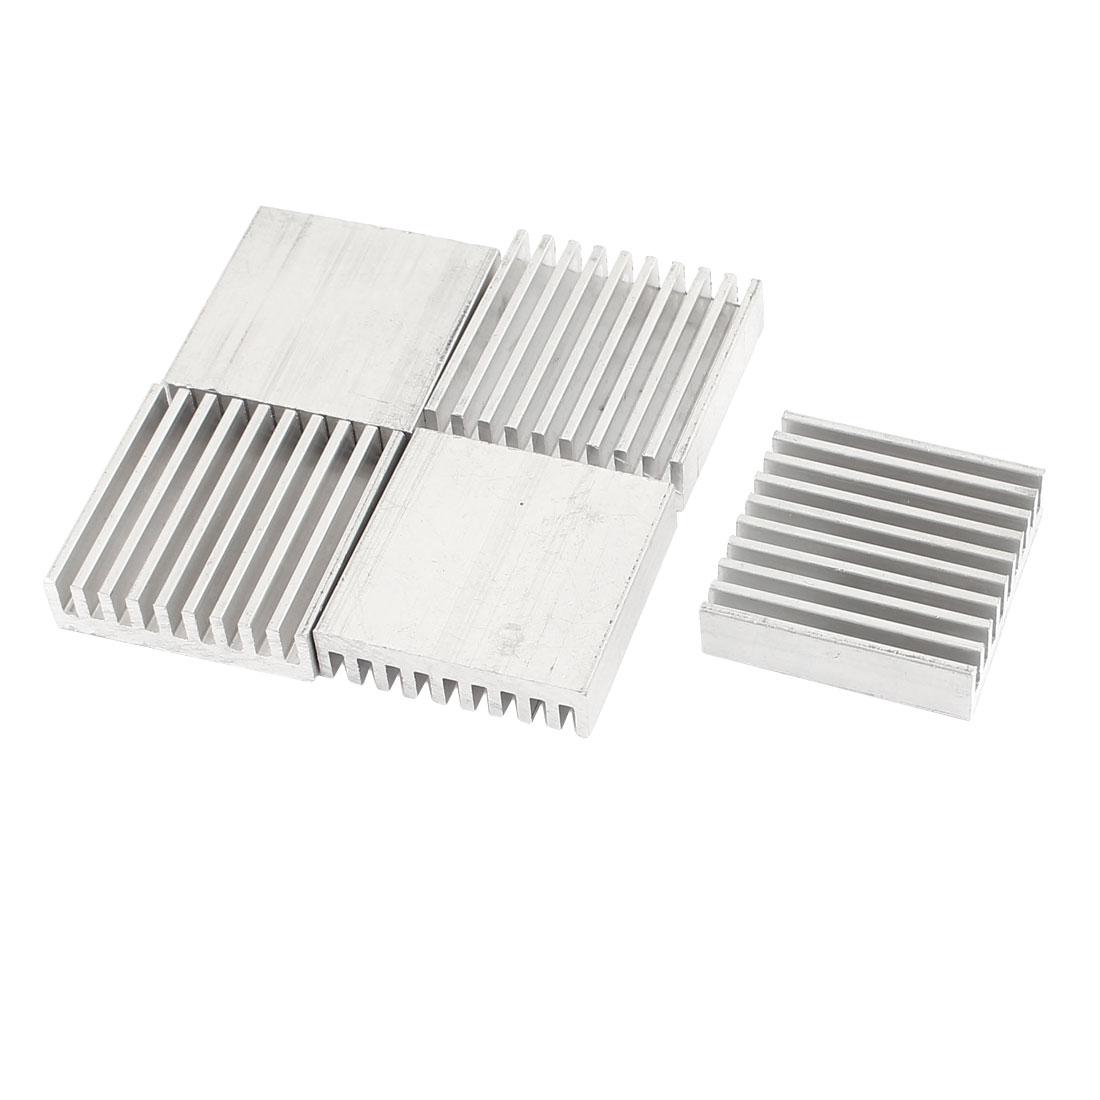 5 Pcs 30 x 30 x 8mm Silver Tone Heatsink Radiating Aluminium Cooler Cooling Fin